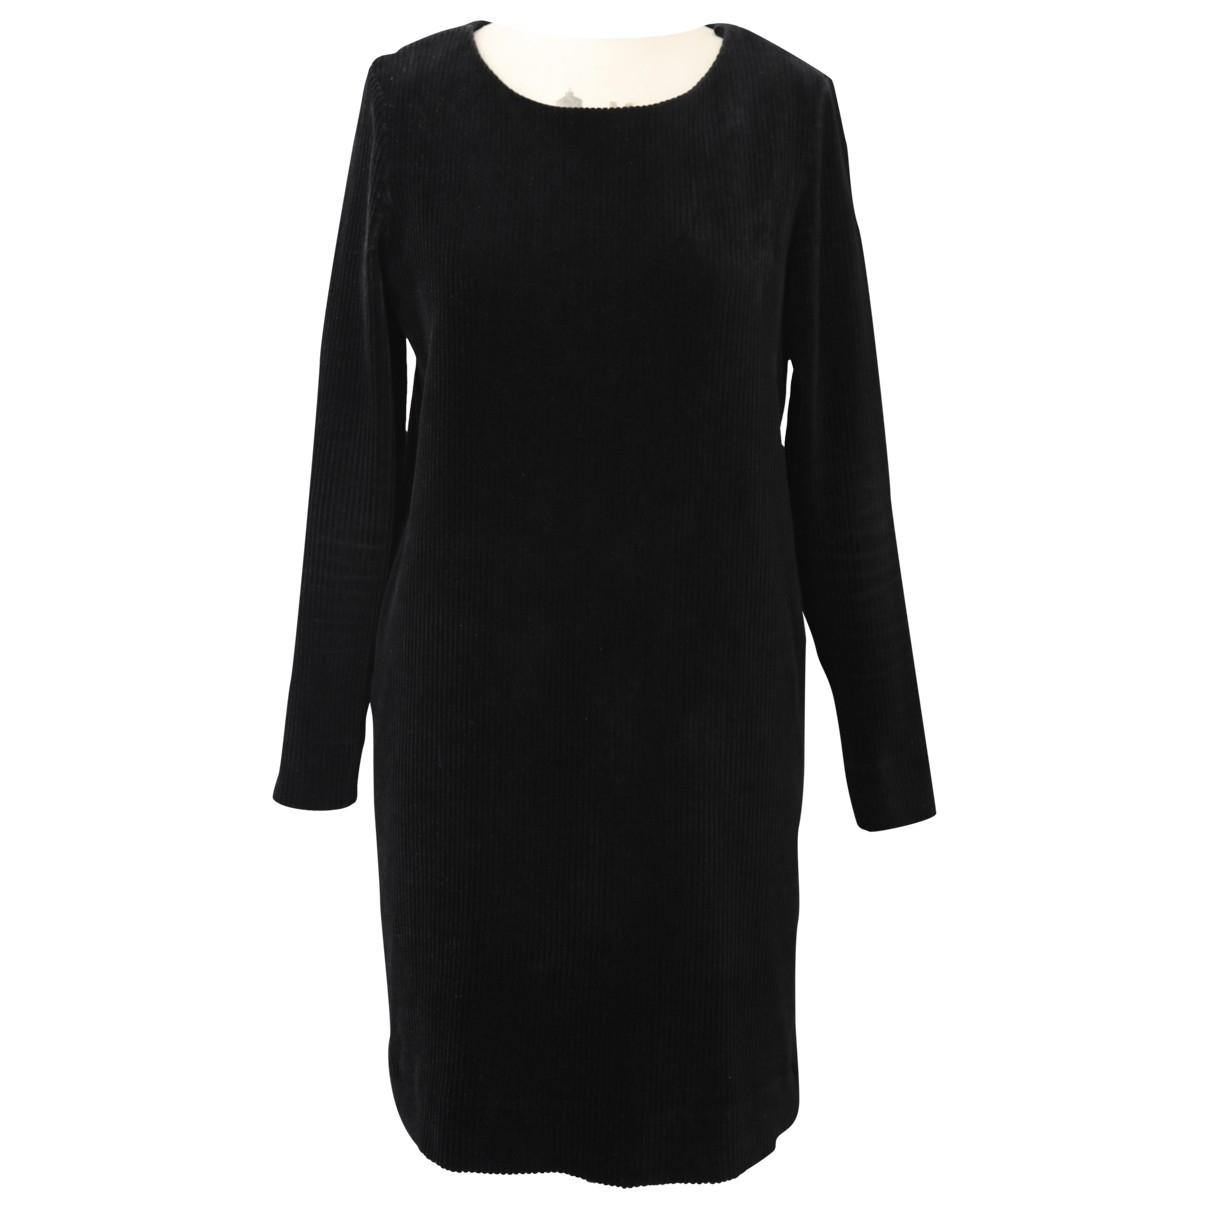 Cos \N Black Cotton - elasthane dress for Women S International